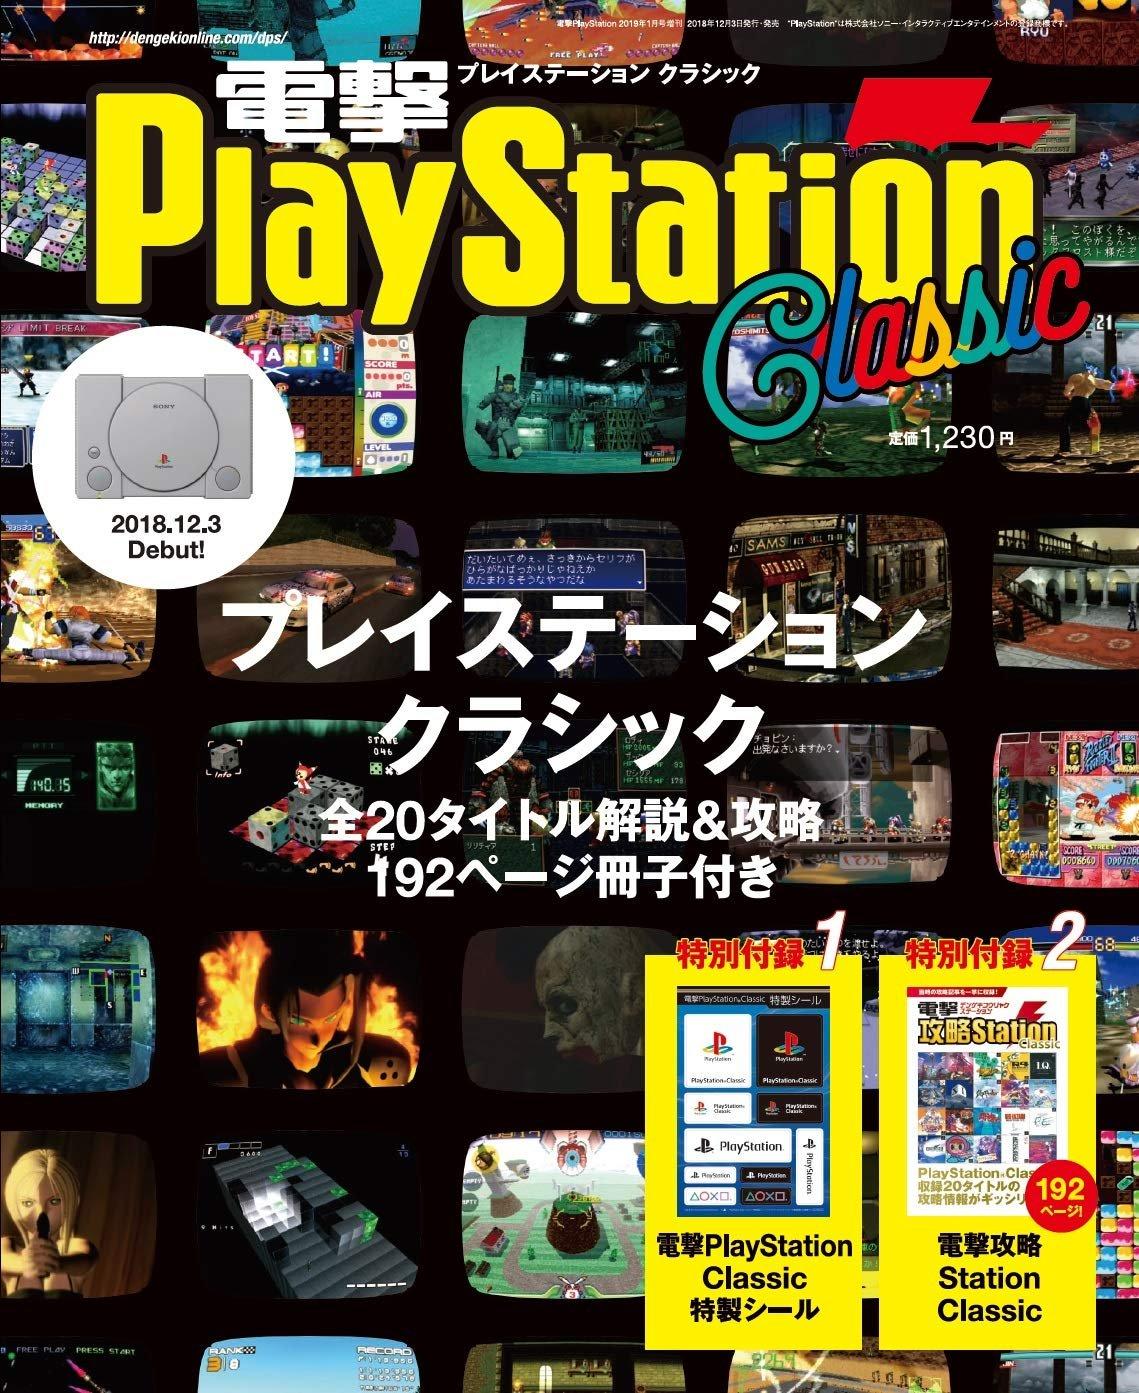 Dengeki PlayStation Classic (January 2019)